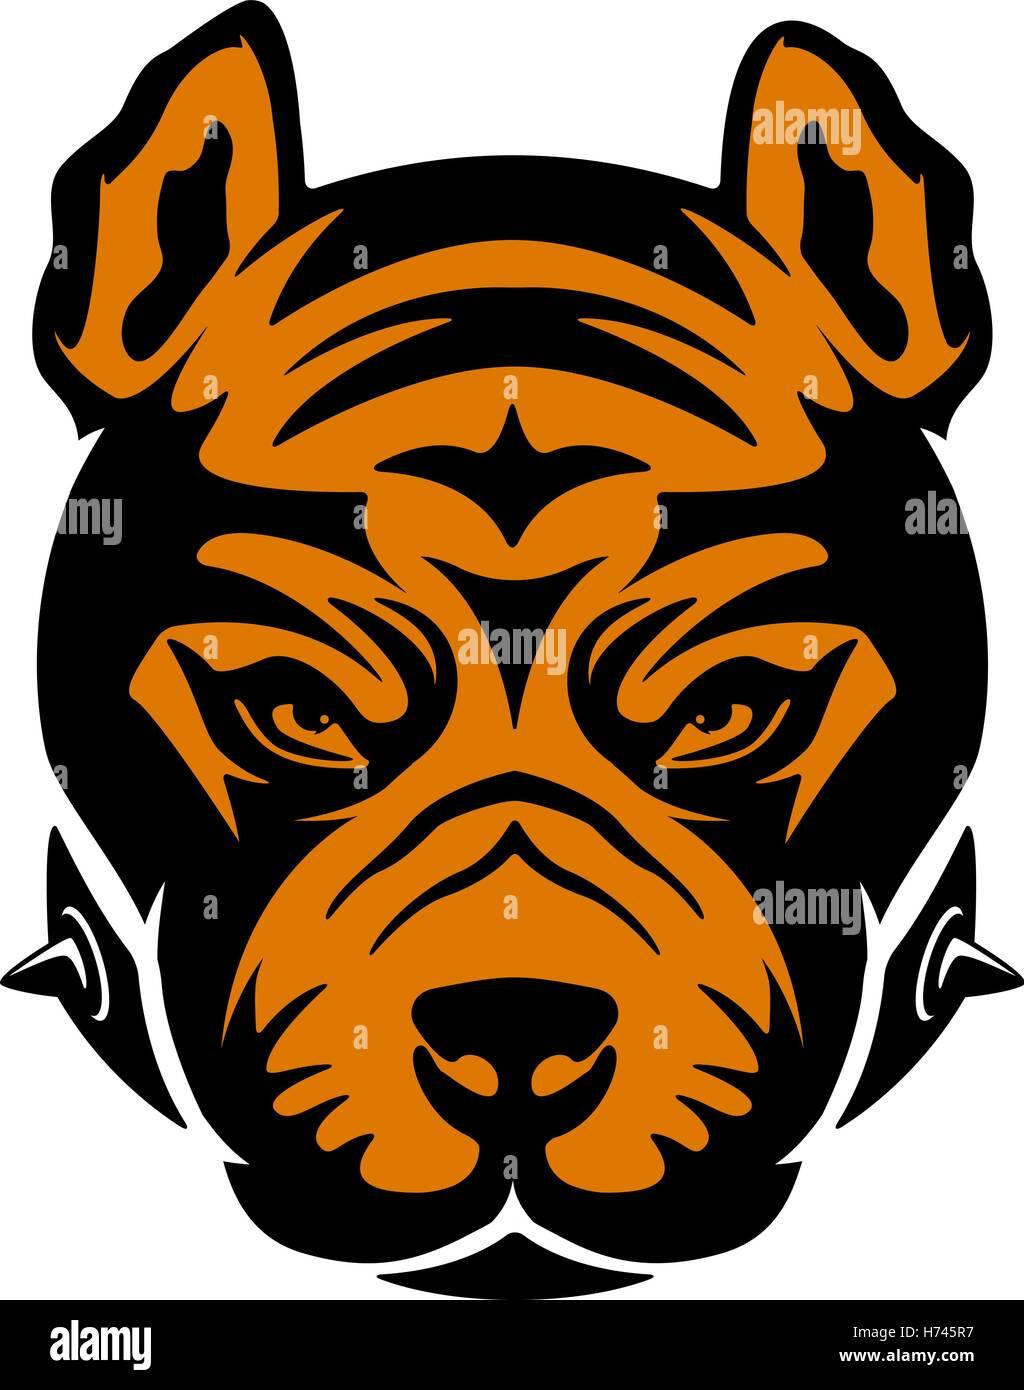 Pit bull  head isolated on white background. Design element for logo, label, emblem, sign, brand mark. Vector illustration. - Stock Image